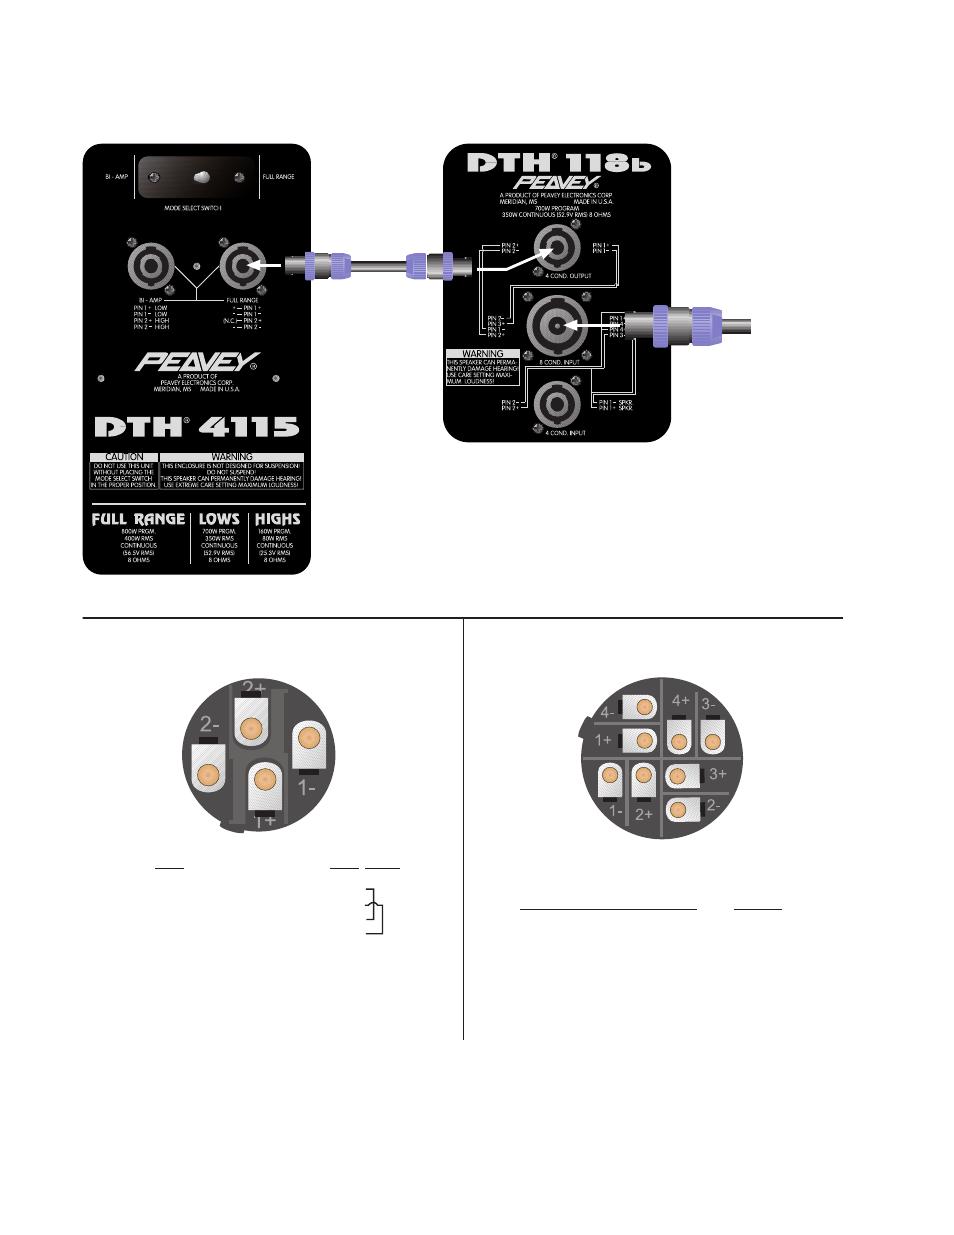 Wiring Diagram Pin Speakon Number Wire Scheme Peavey Dth 4115 User Manual Page 8 16